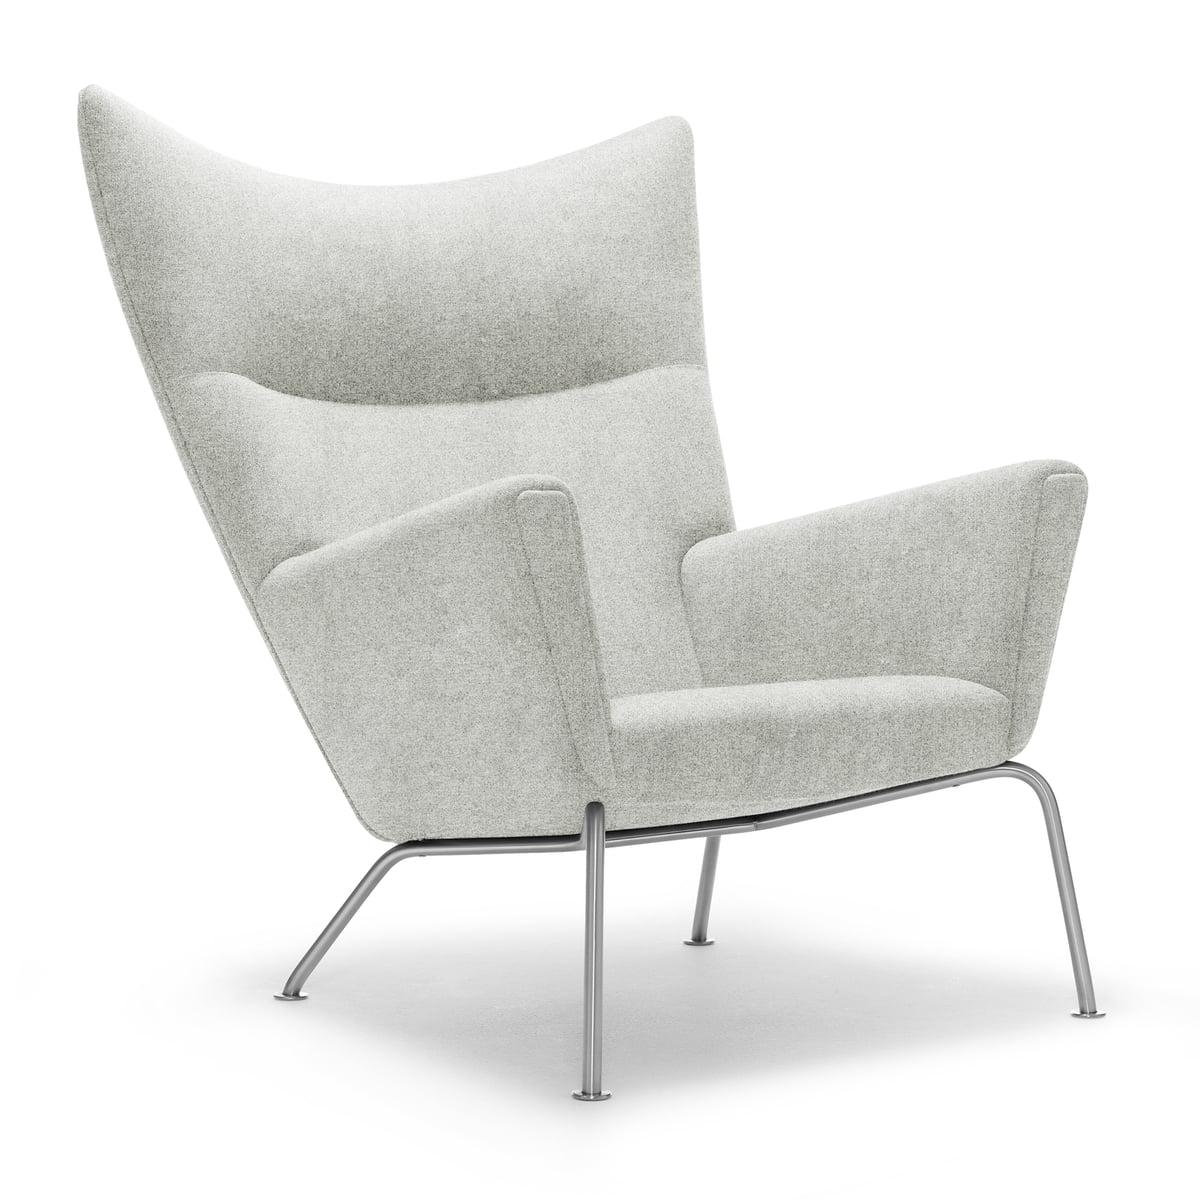 ch445 wing chair divina melange 2 col. 120 by carl hansen TERJVLI